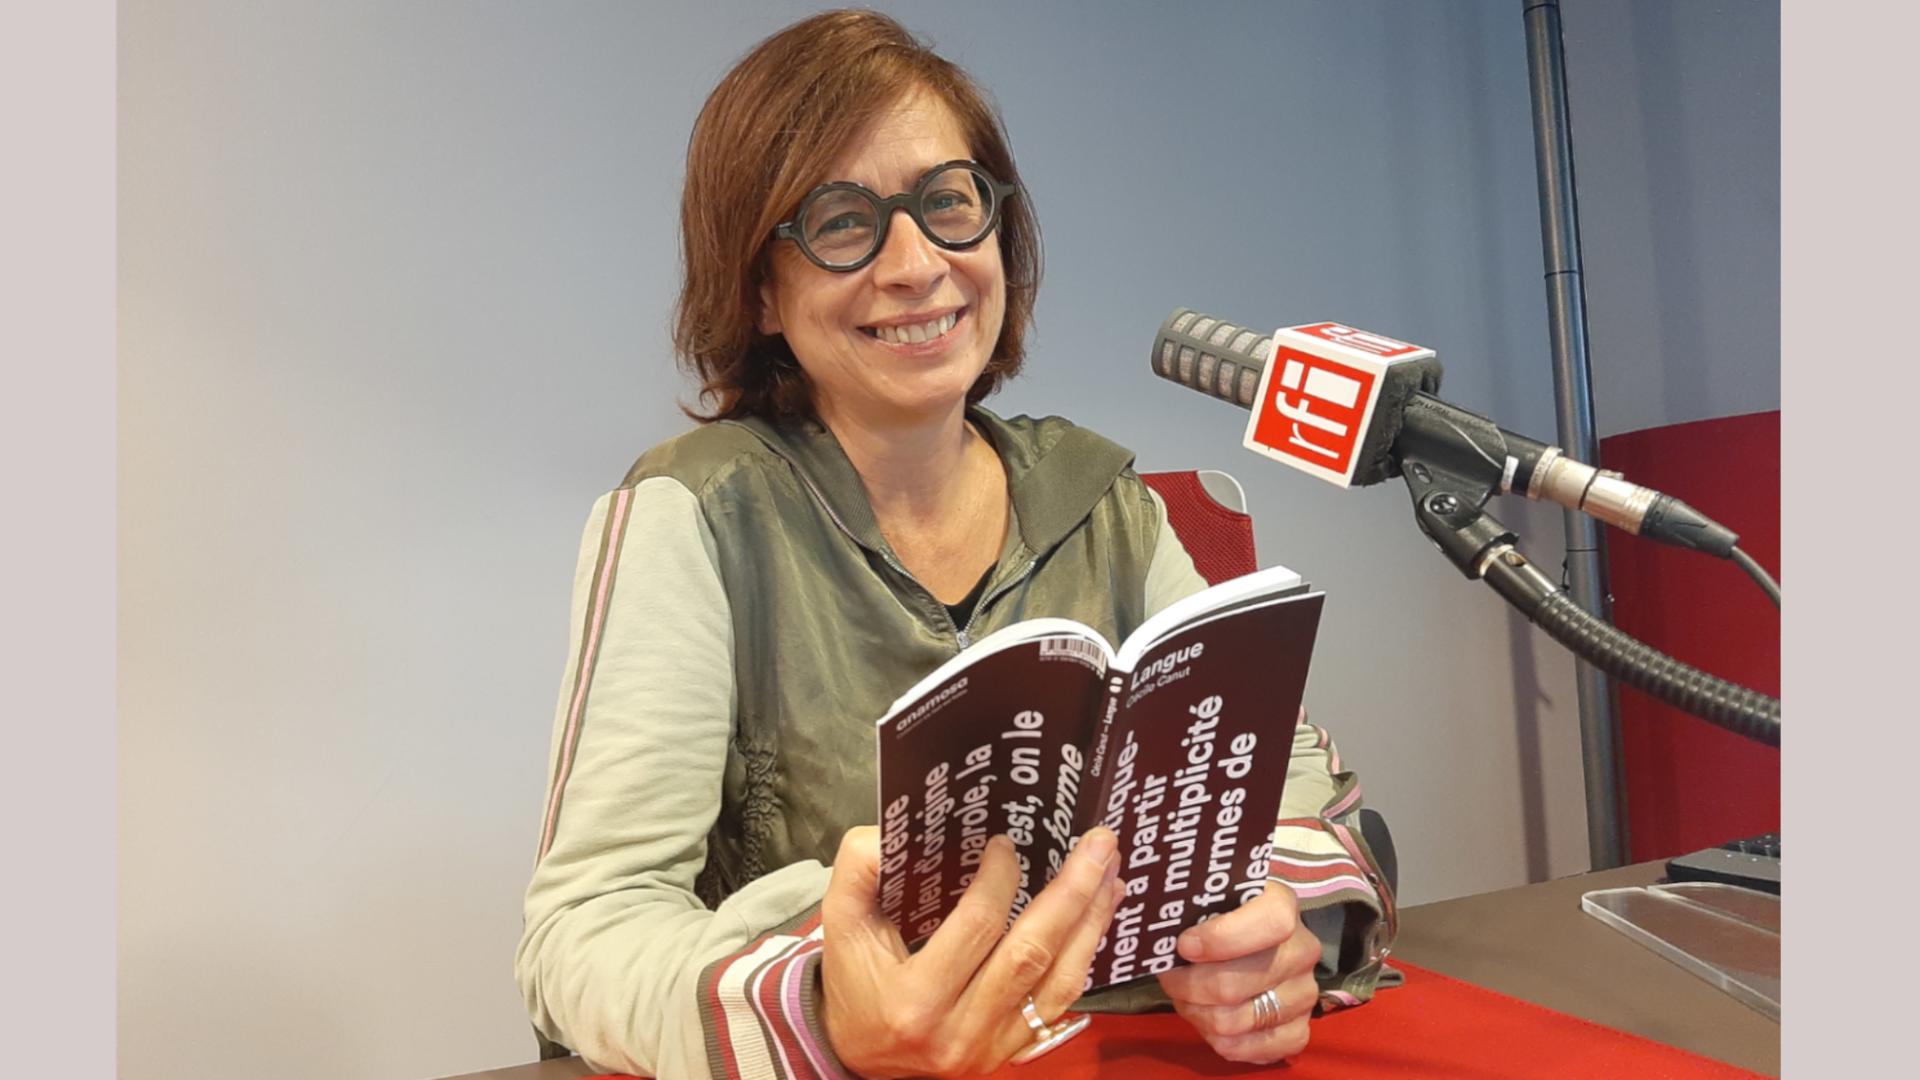 Cécile Canut